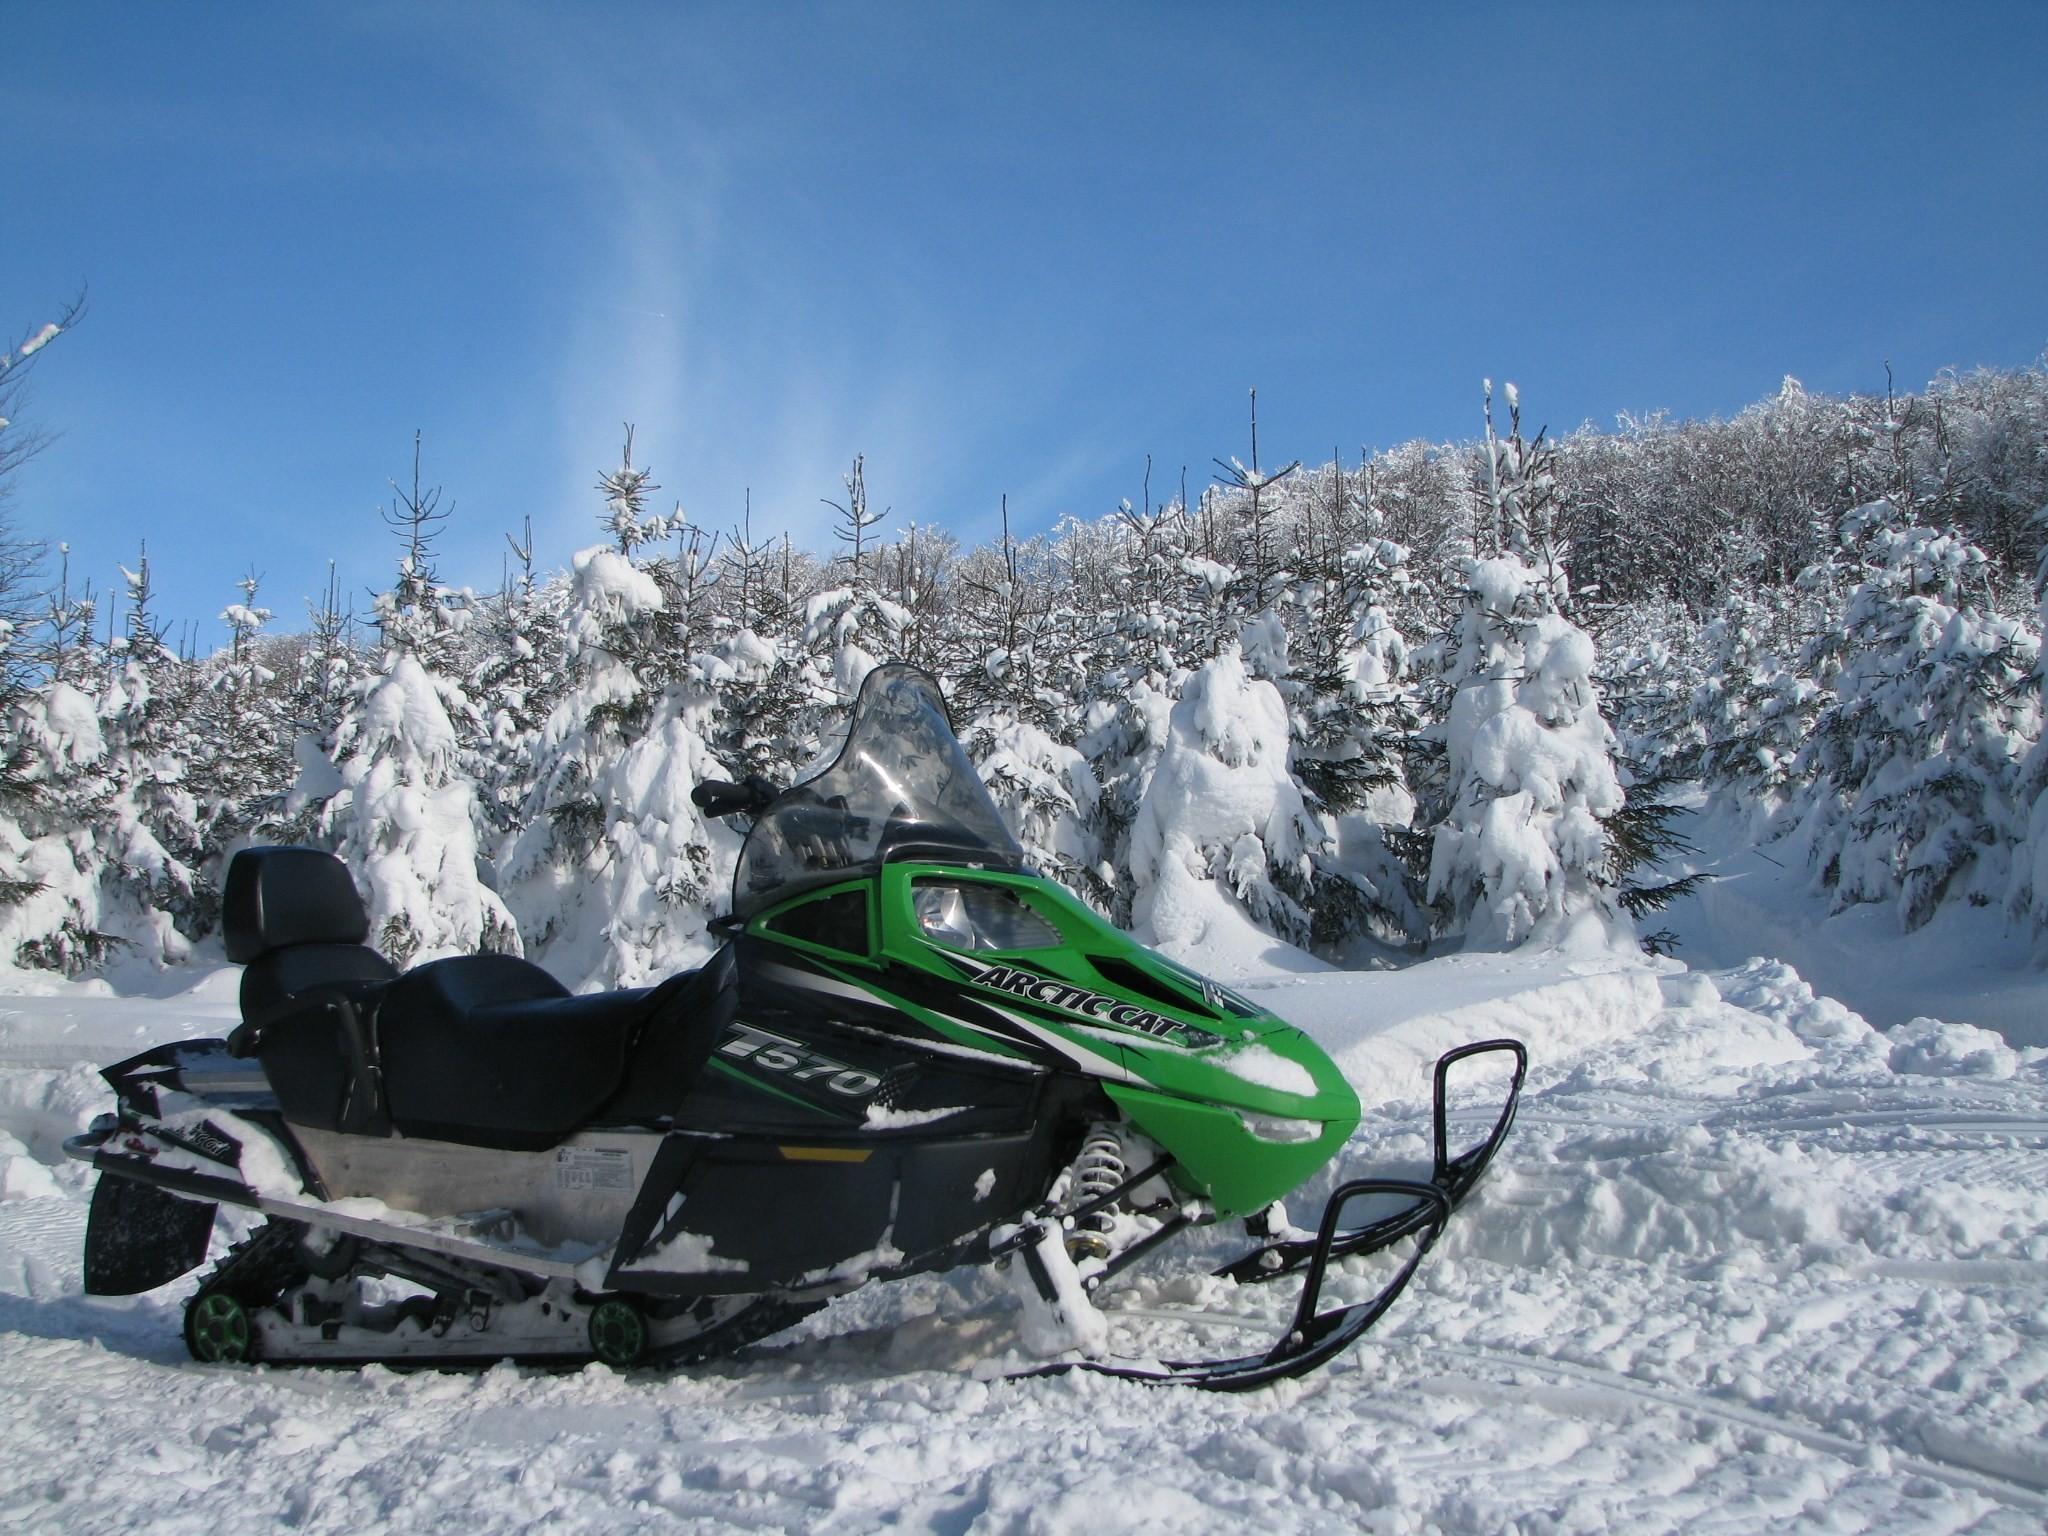 HD Widescreen snowmobile wallpaper – snowmobile category